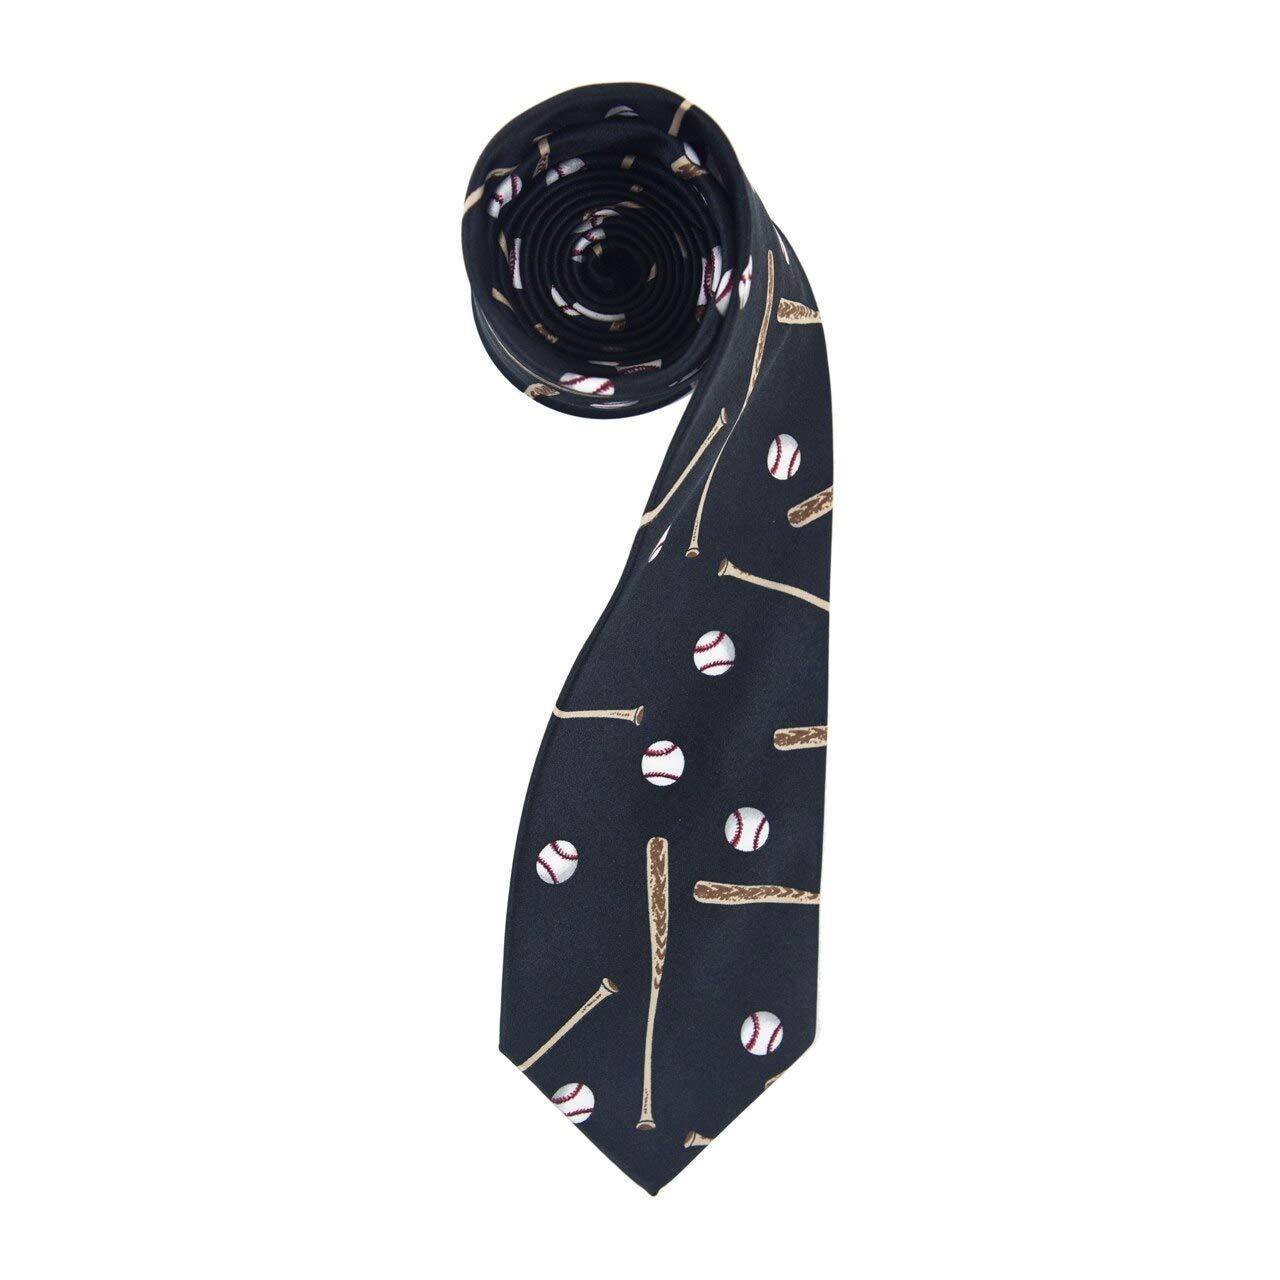 Boys Dark Gray /& White Baseballs /& Bats Sports Necktie Tie Neckwear